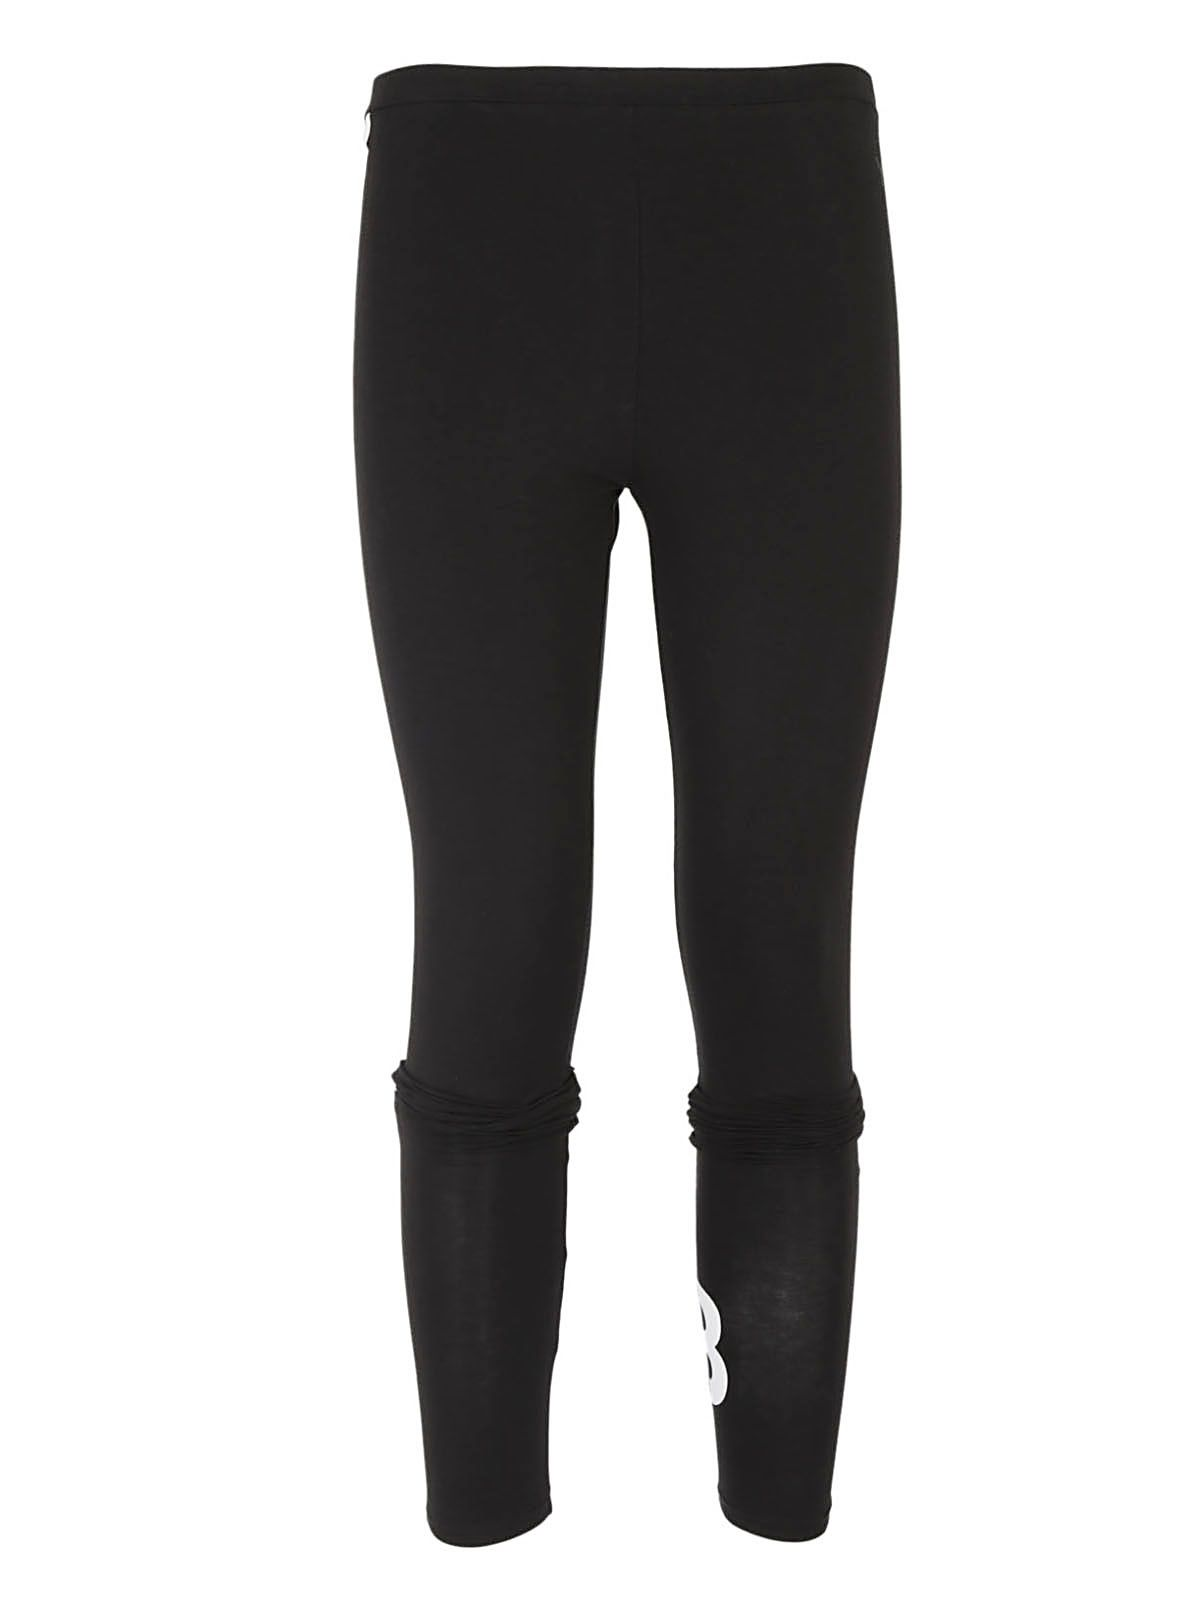 Adidas Y-3 Classic Leggings